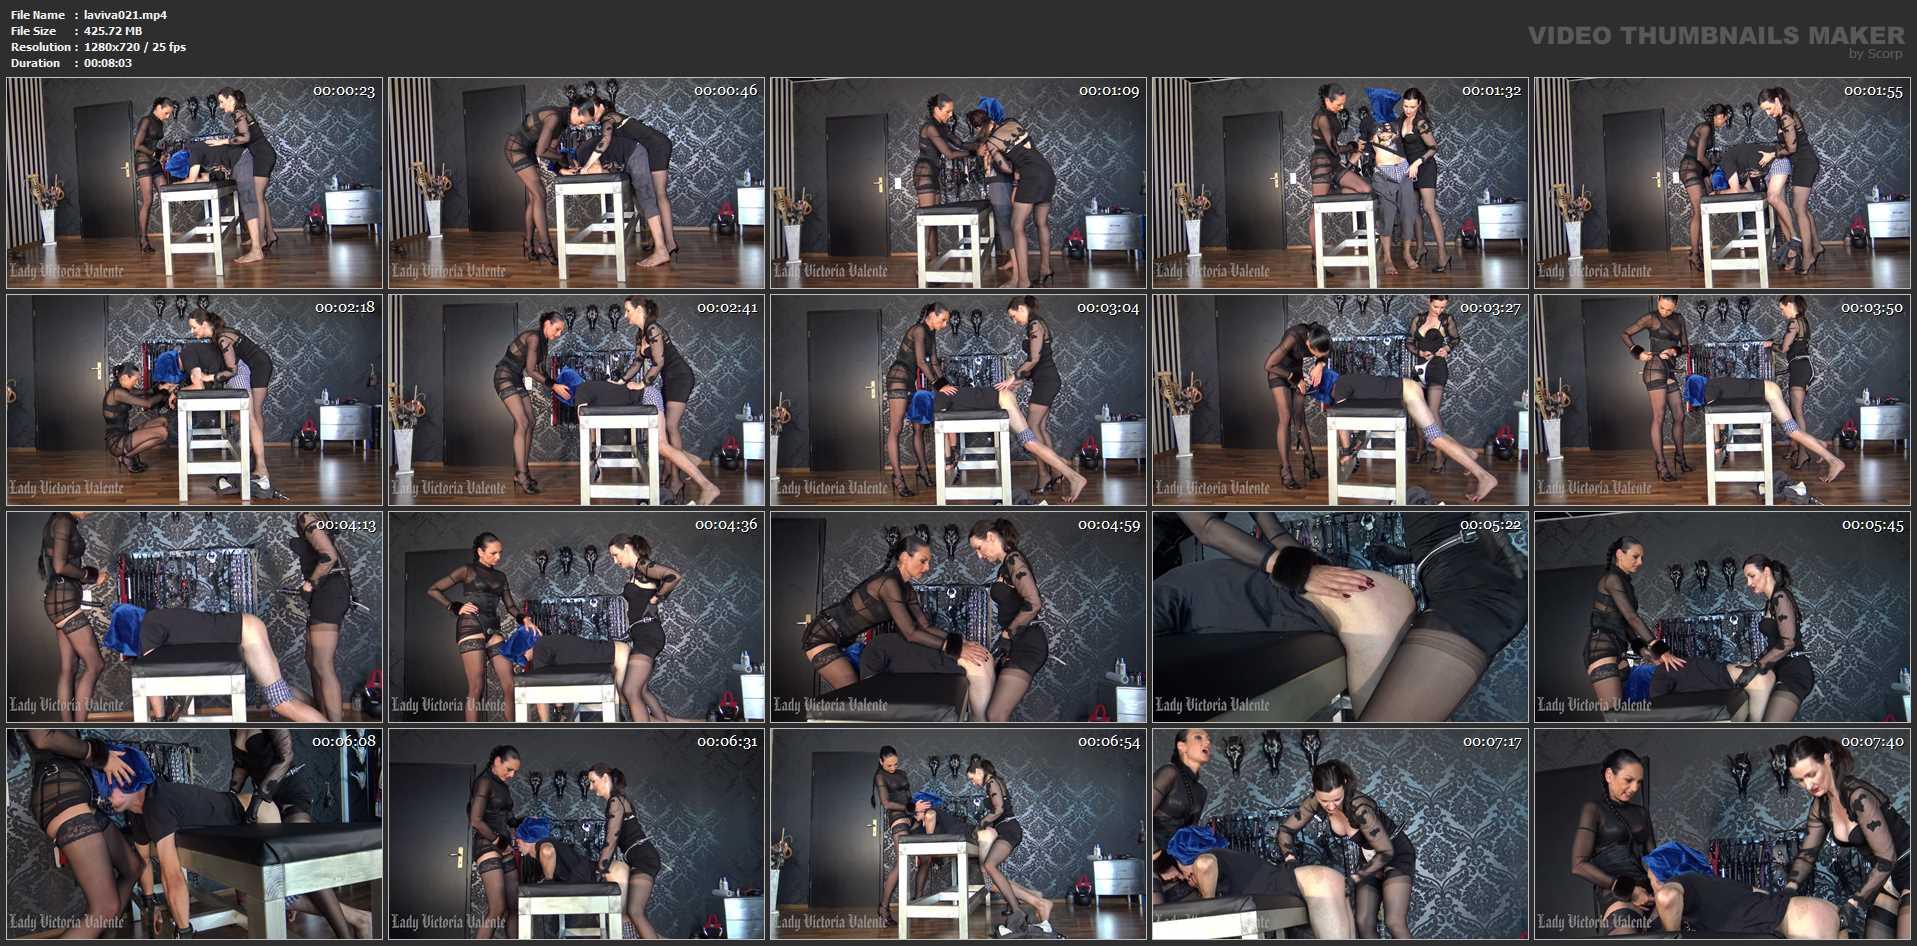 Lady Victoria Valente In Scene: Strap-On game with Madame Catarina - CLIPS4SALE / LADYVICTORIAVALENTE - HD/720p/MP4